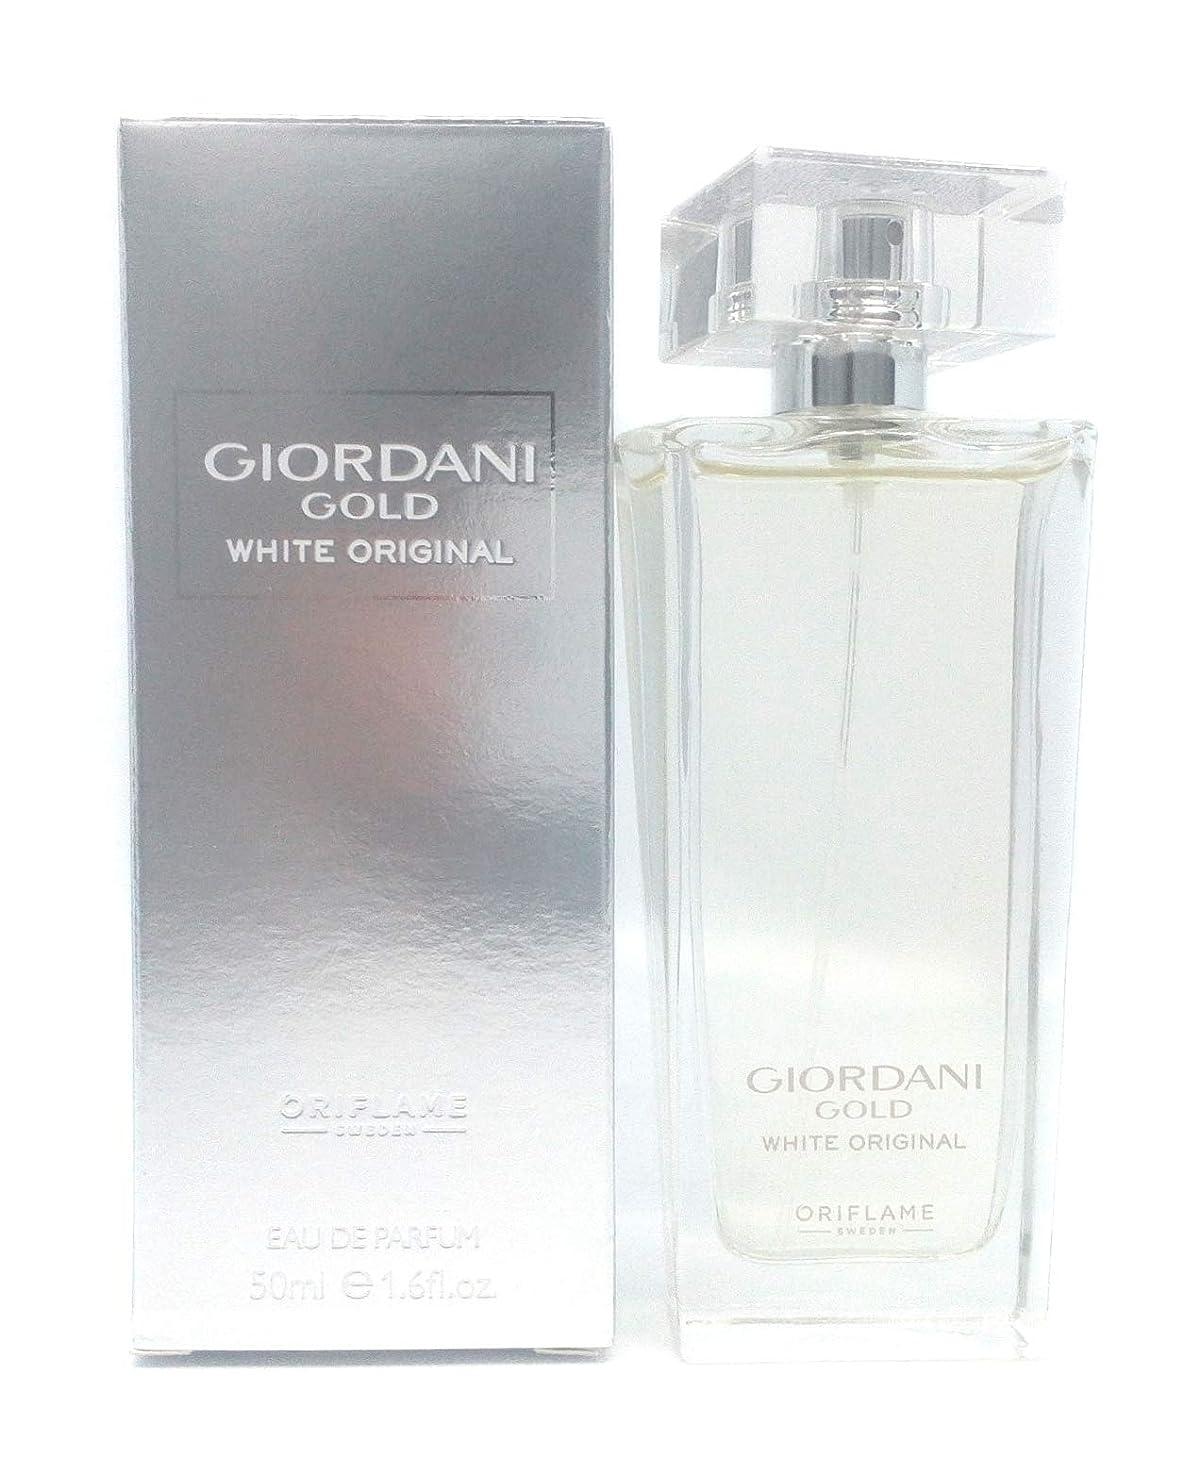 歩行者土砂降り懐疑的ORIFLAME Giordani Gold White Original Eau de Parfum Natural Spray 50ml - 1.6oz